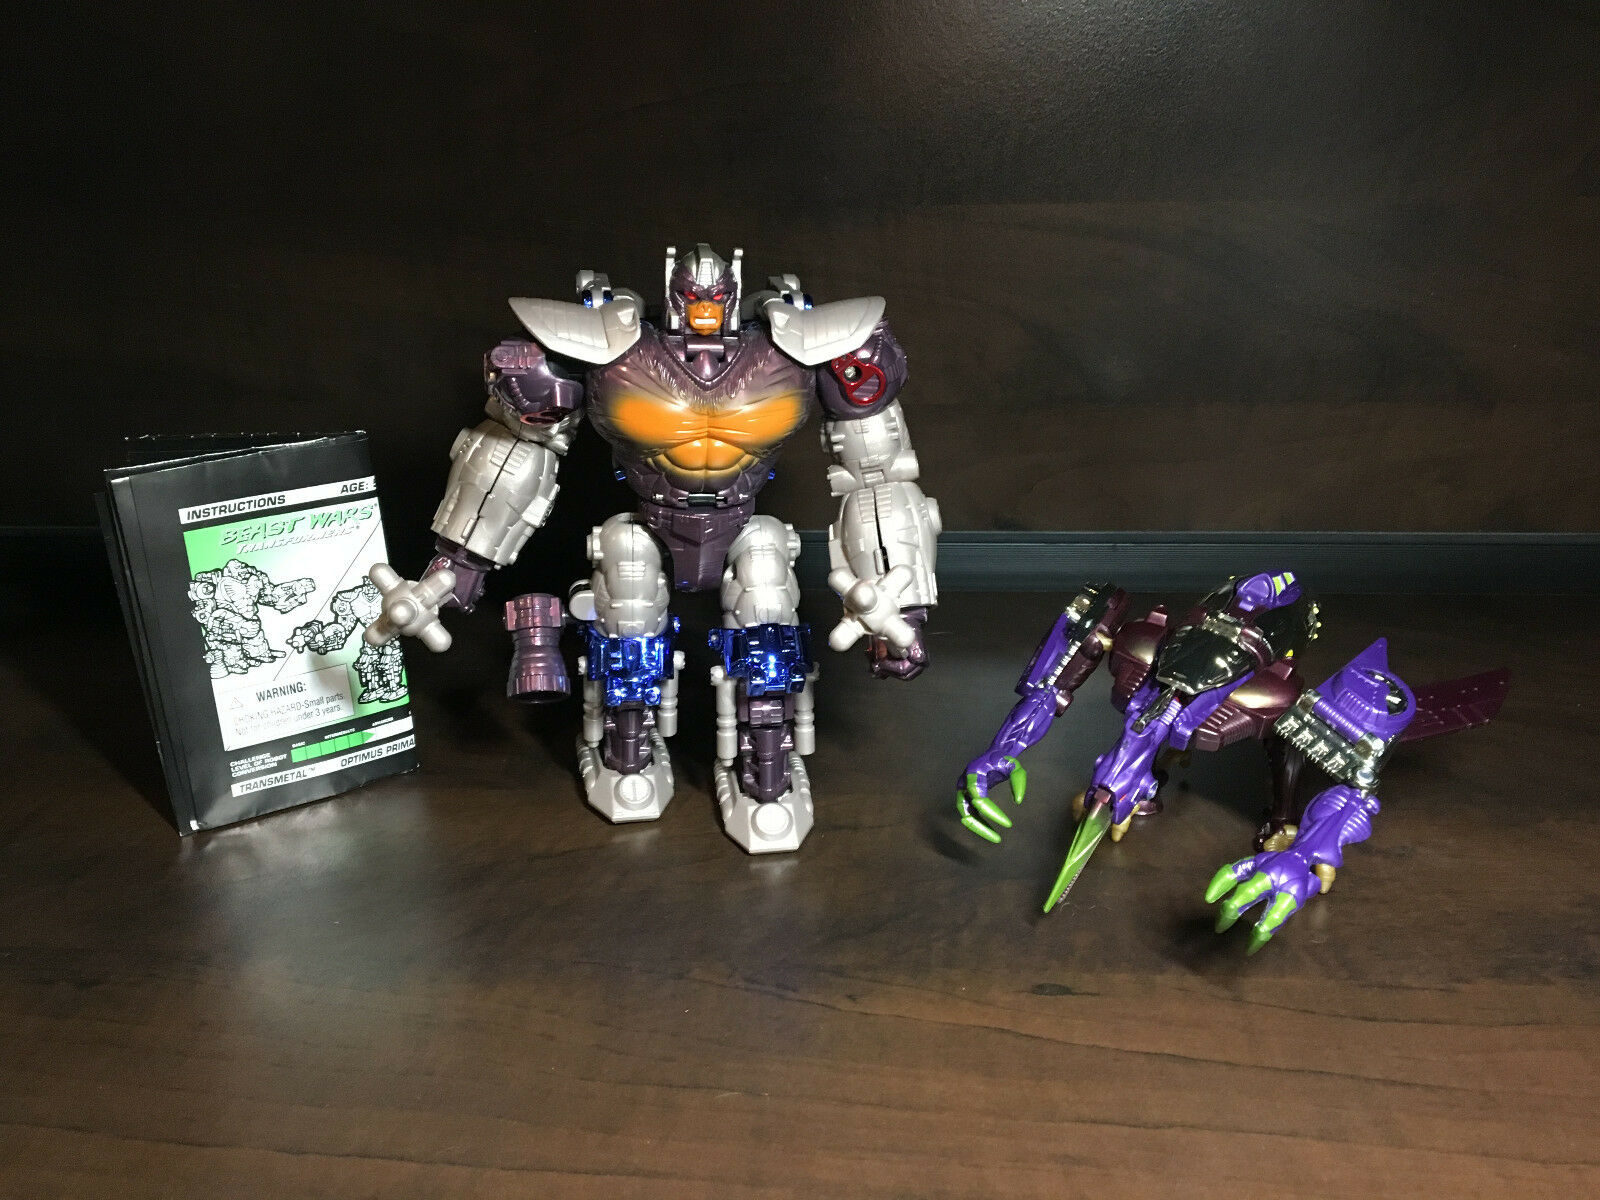 Transformers Beast Wars Transmetal Lot of 2 - Optimus Primal, Terrorsaur